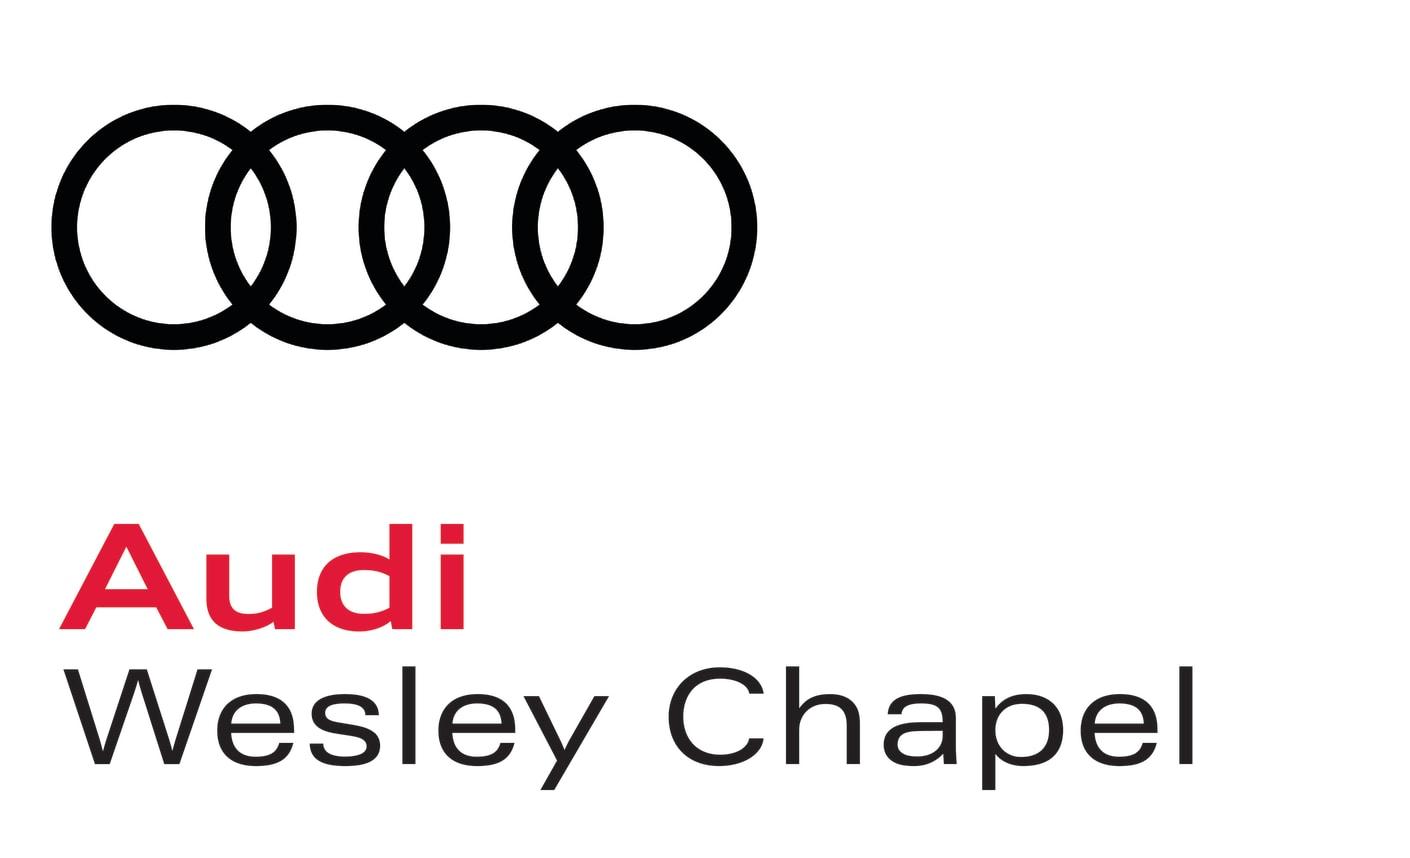 041917lgAudi-Wesley-Chapel-w1410.jpg